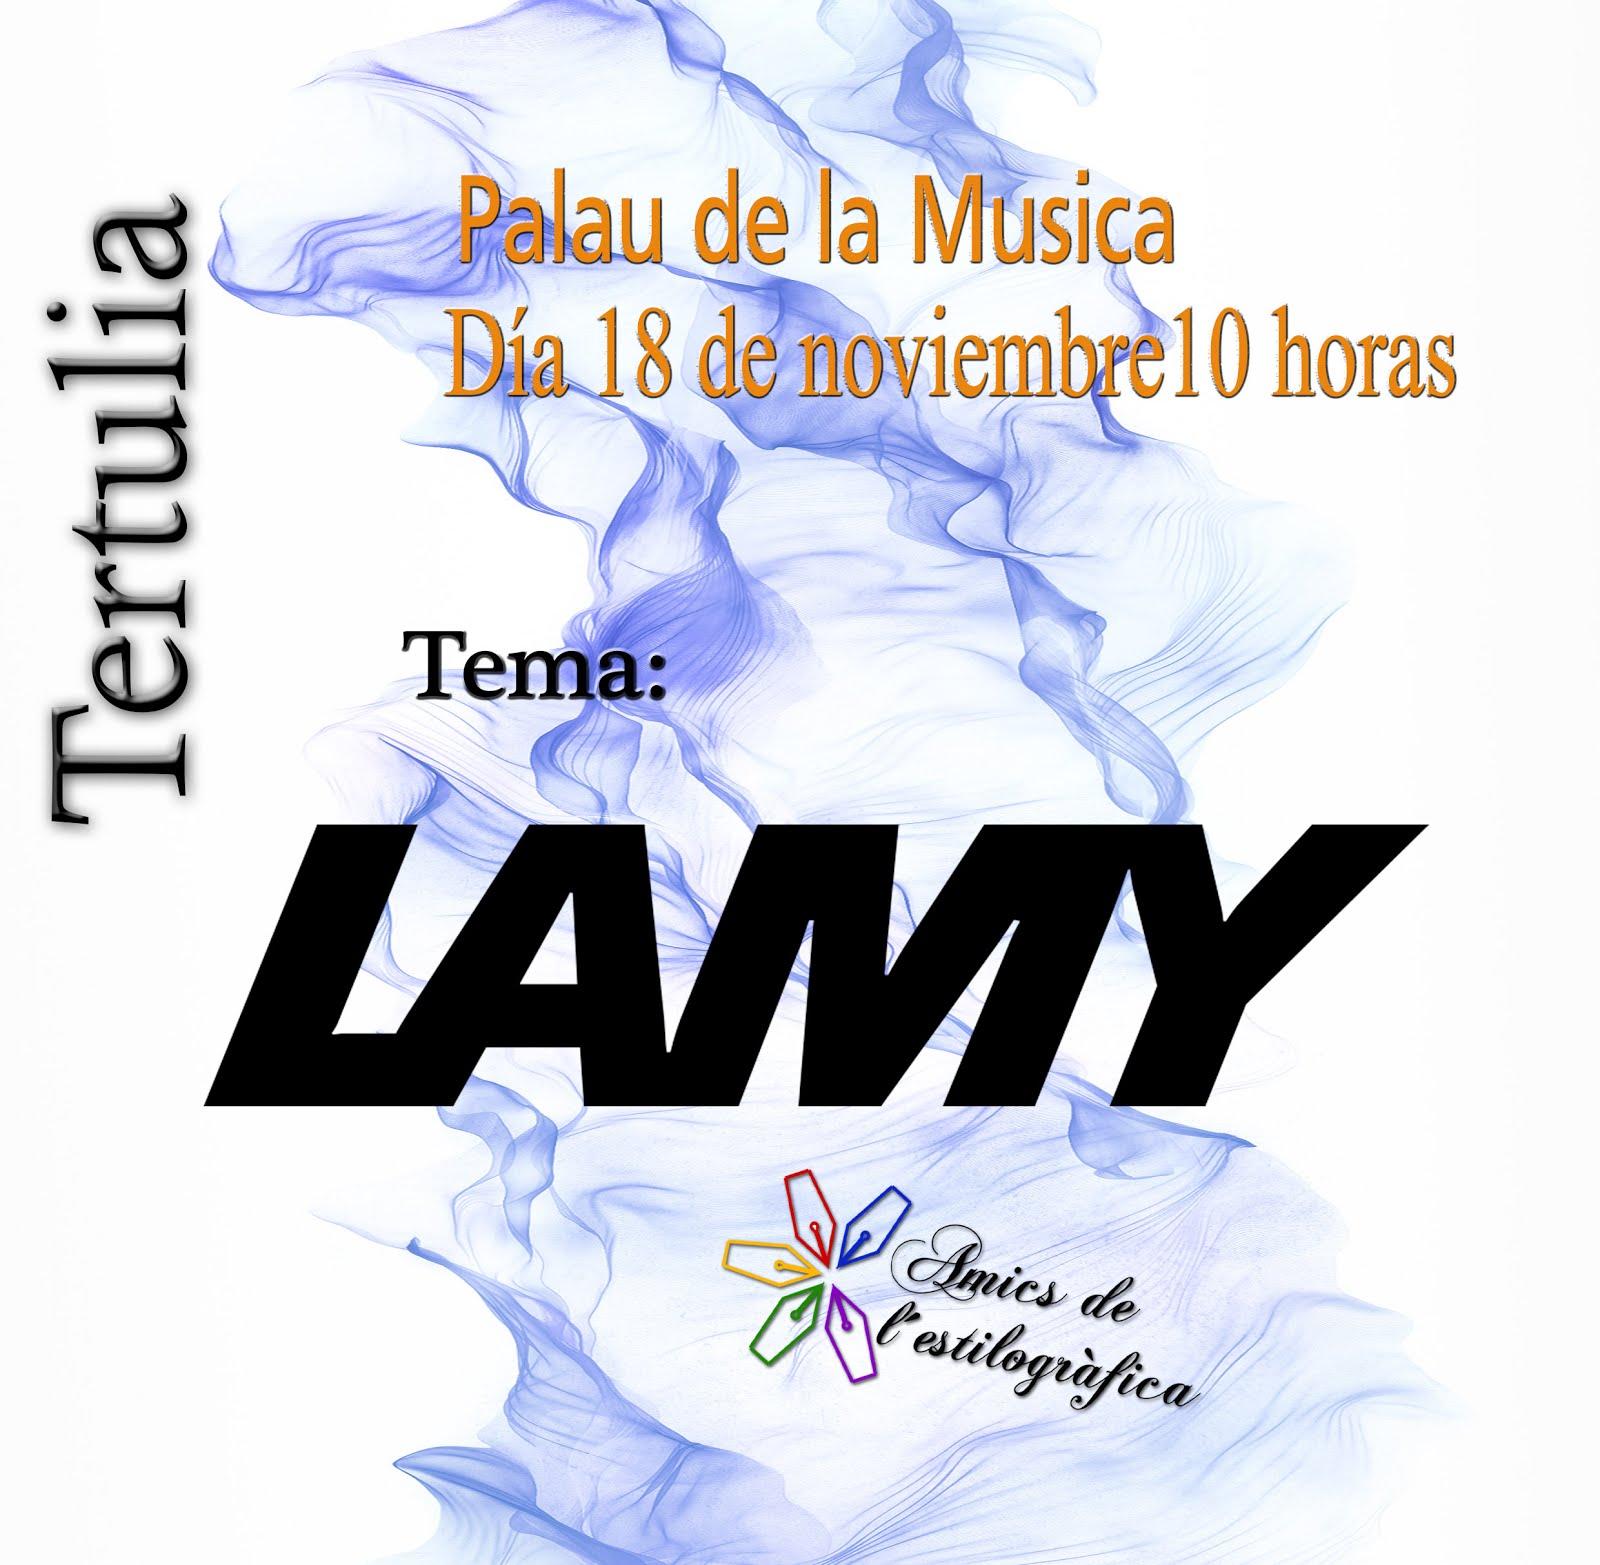 59 TERTULIA DÍA 18-11-2017 (LAMY)